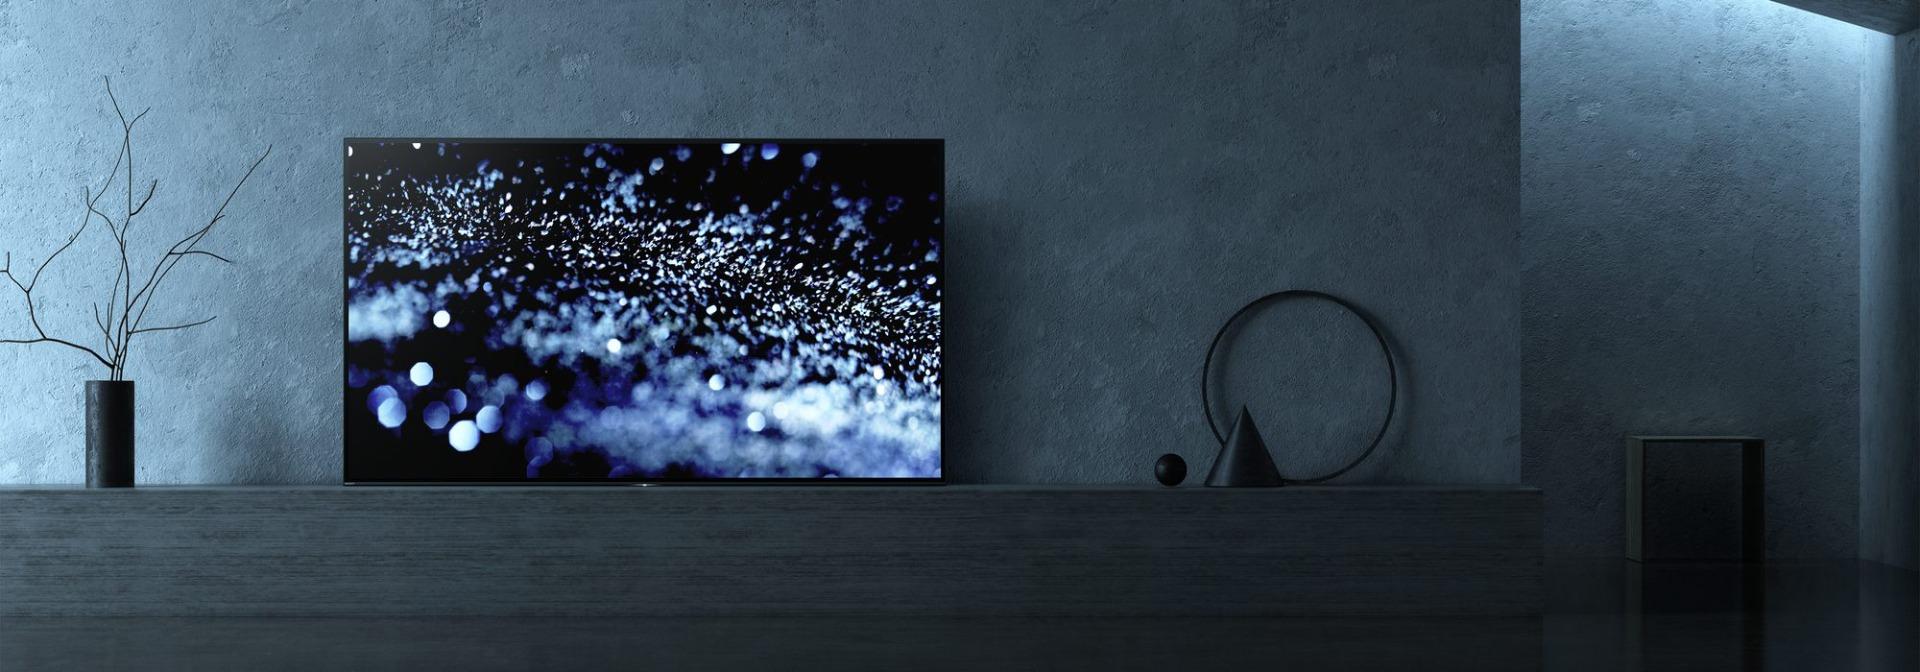 OLED-televisie kopen | Expert helpt je verder